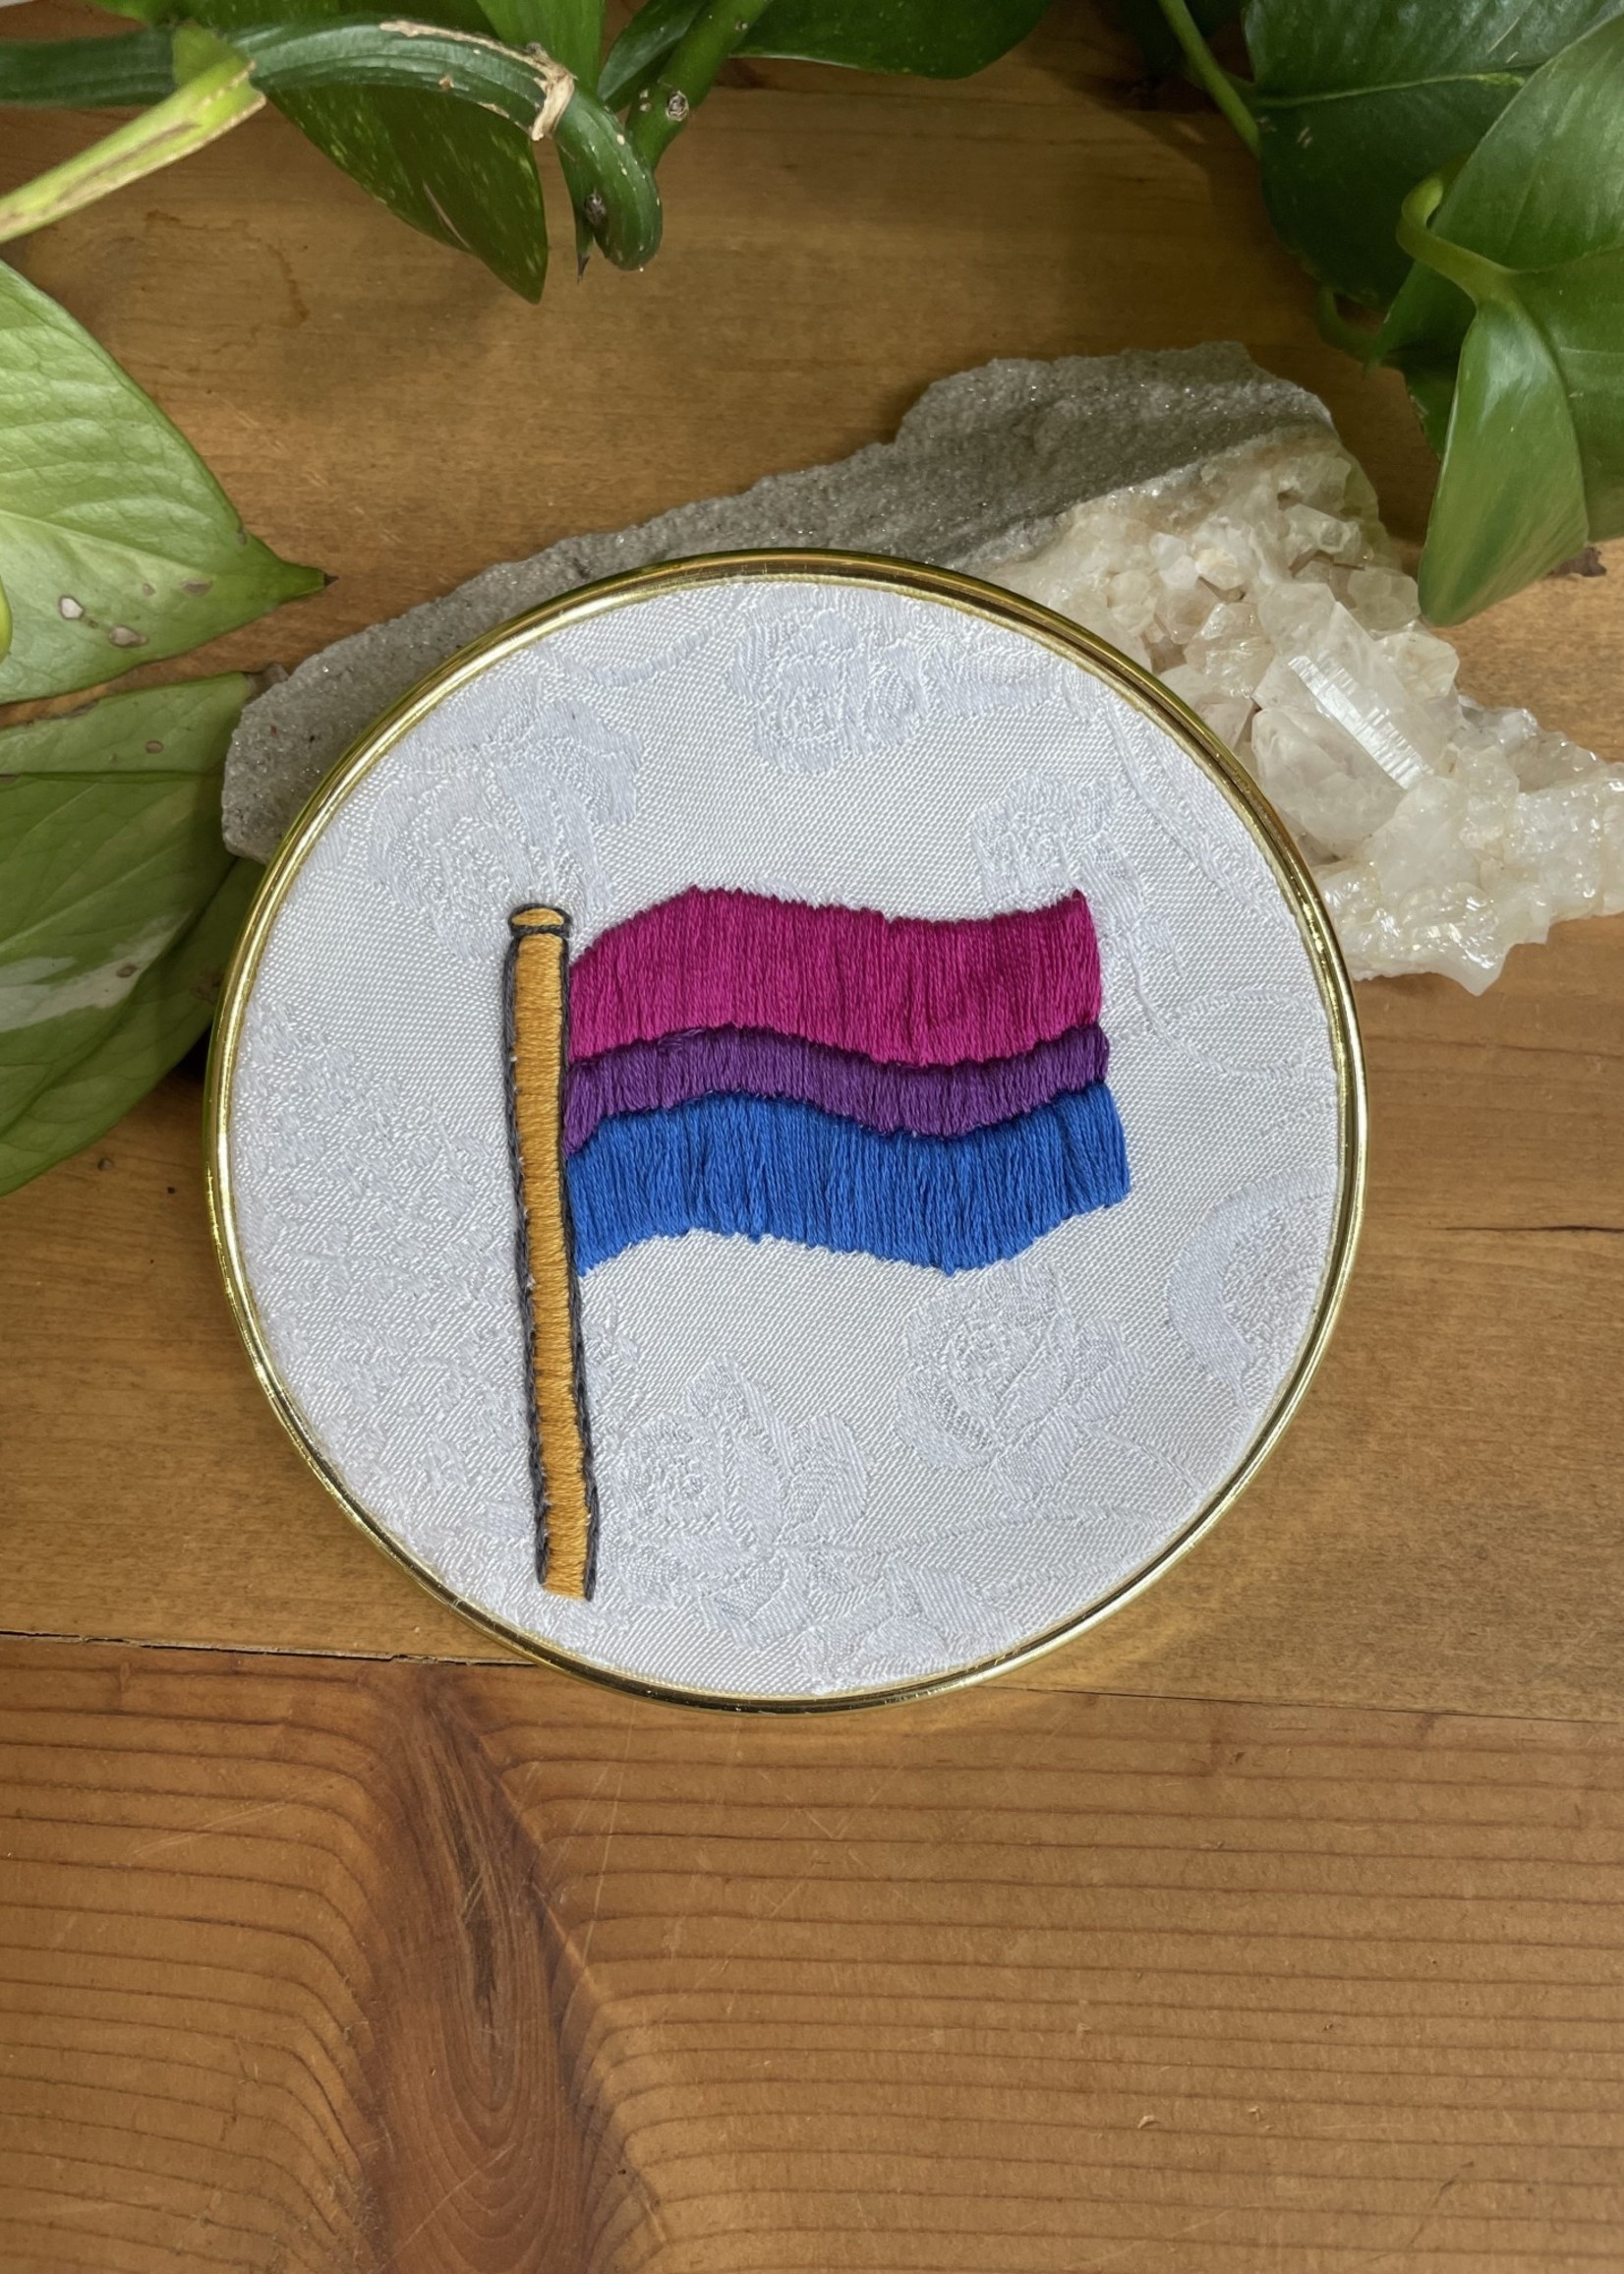 calliope embroidery Calliope Embroidery - Pride Flags: